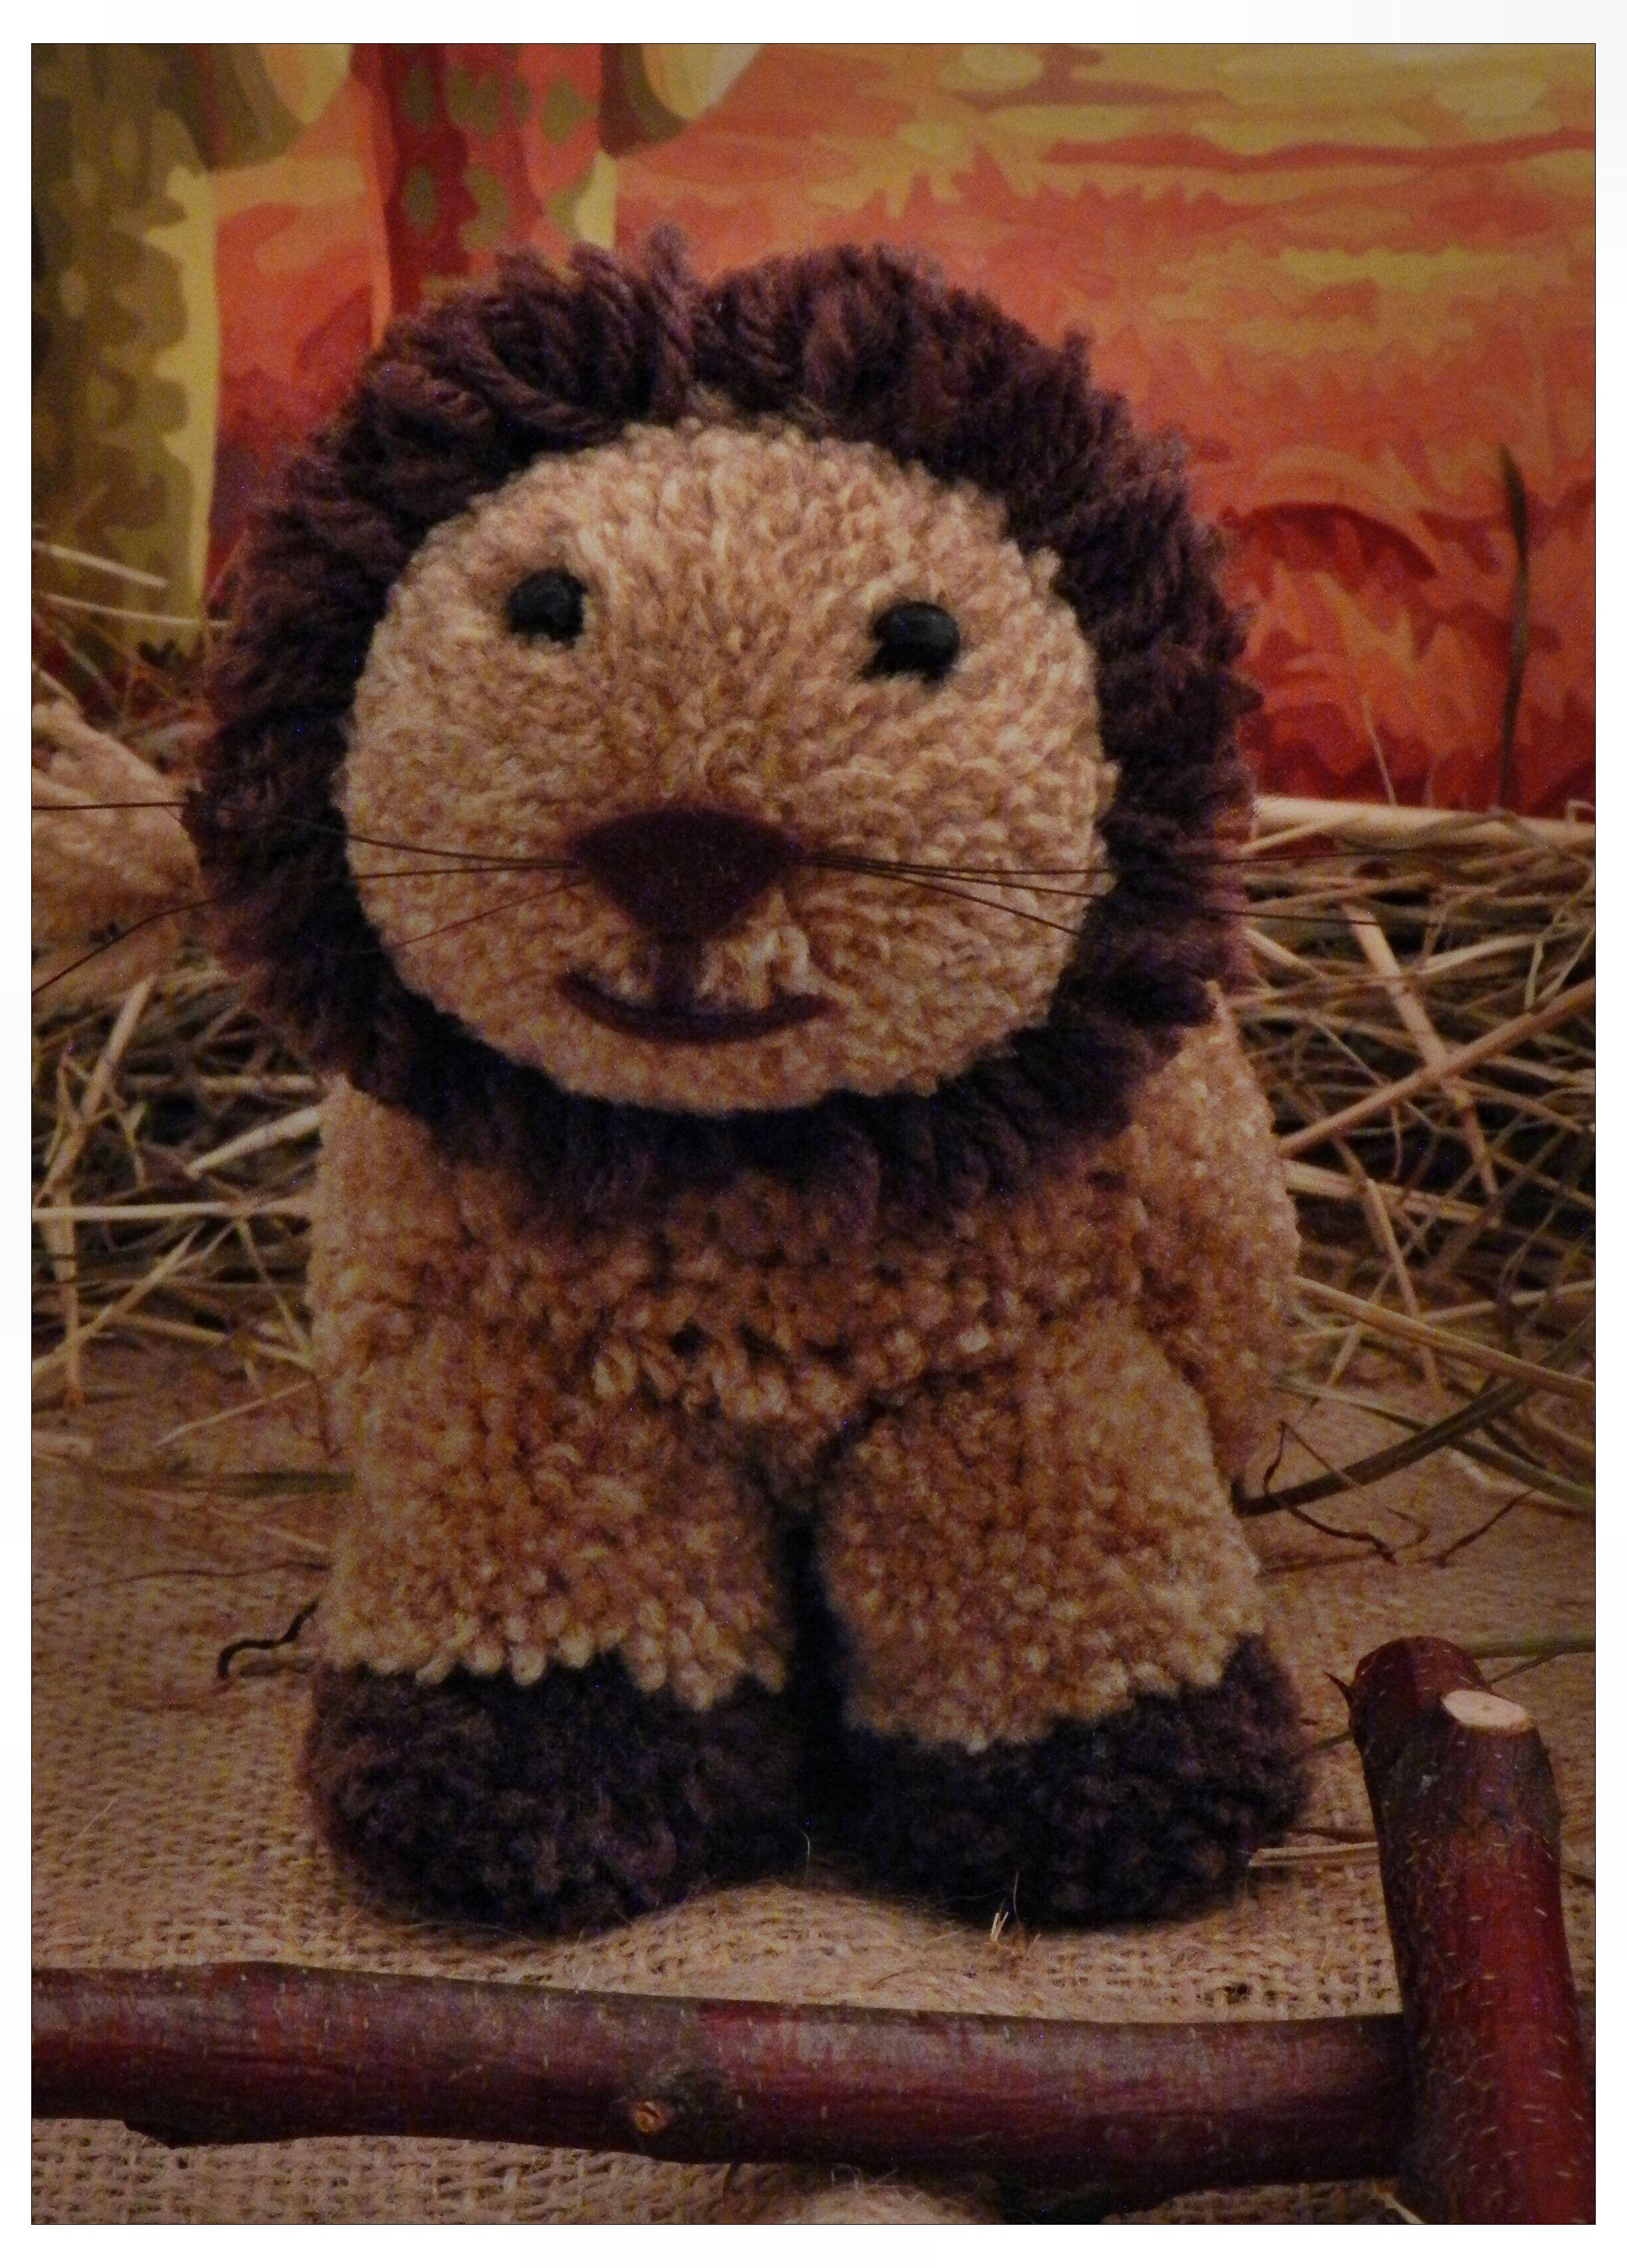 Löwe aus Pompons basteln | Bommeltiere | Pinterest | Pompons basteln ...